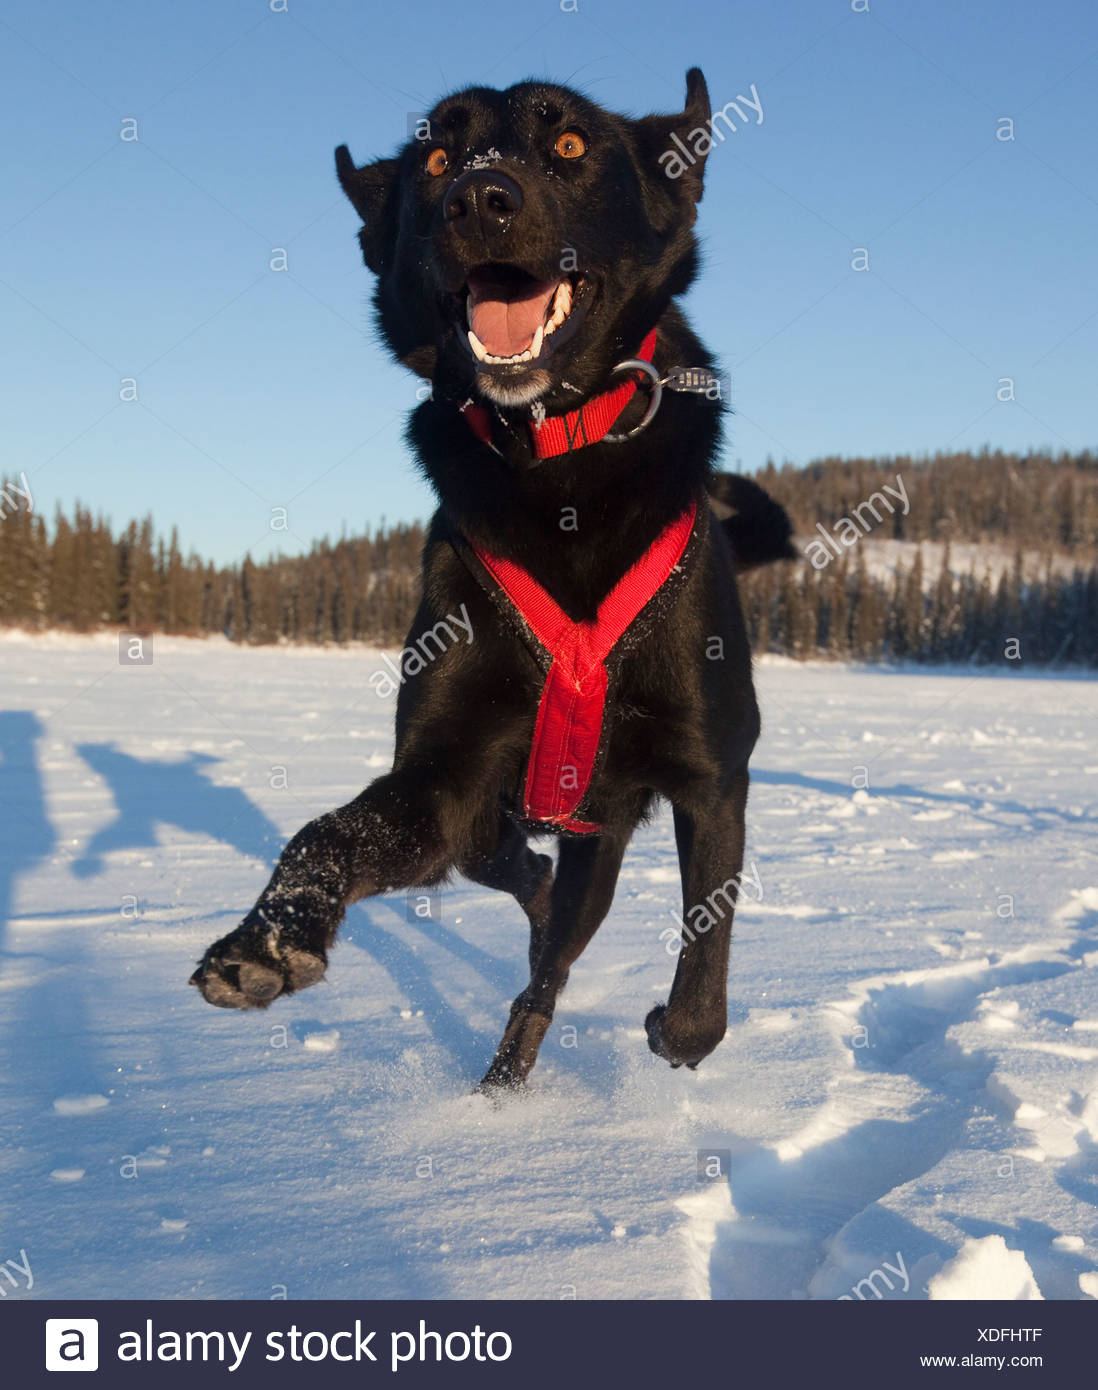 Playing sled dog, Alaskan Husky, in harness, Yukon Territory, Canada - Stock Image